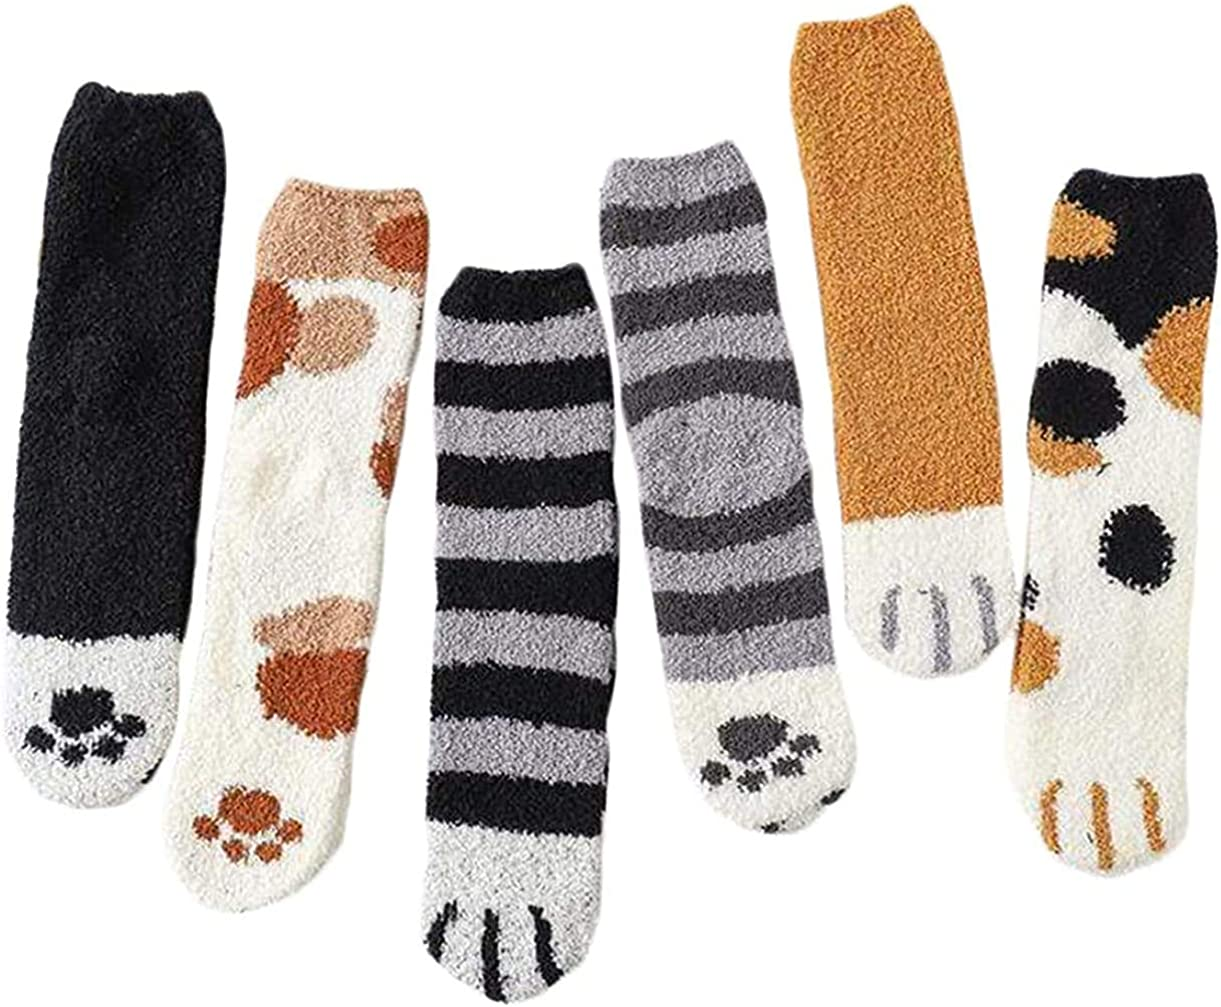 Women Winter Fluffy Fuzzy Warm Slipper Socks Cute Cat Paw Home Sleeping Animal Socks